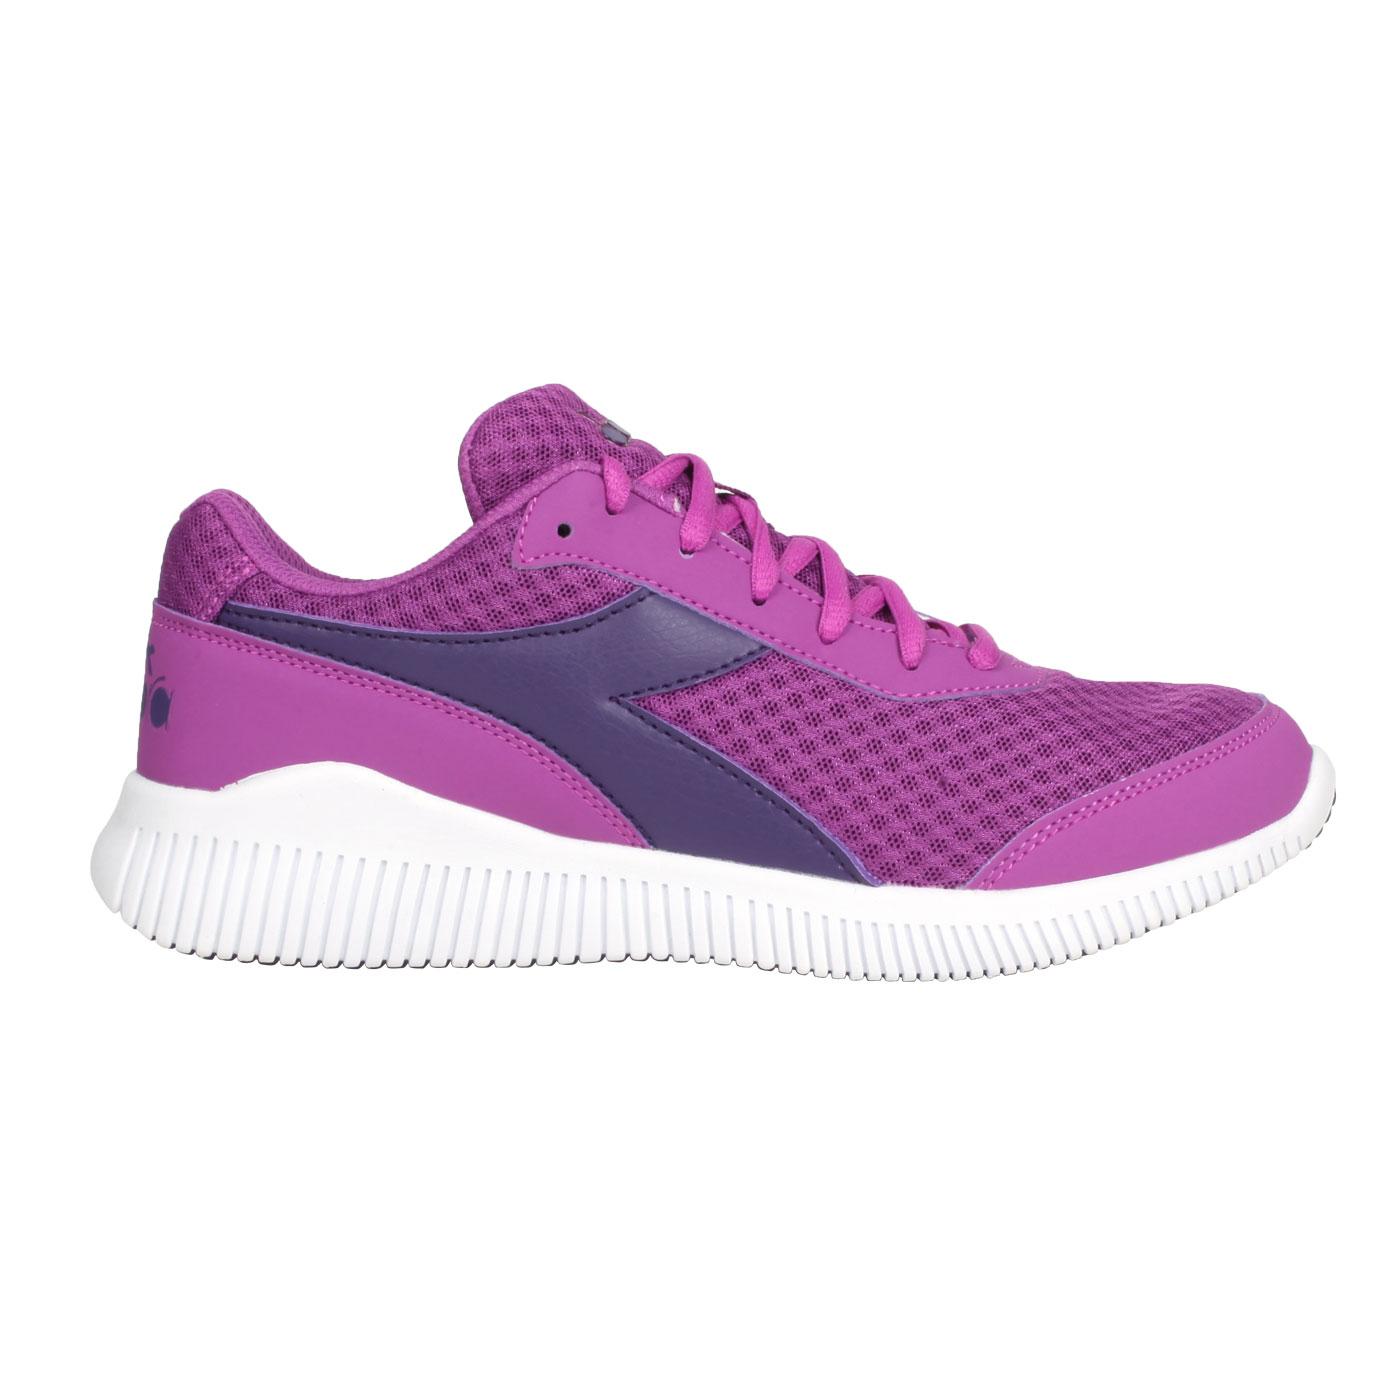 DIADORA 女款進口慢跑鞋 DA175622-C8906 - 紫